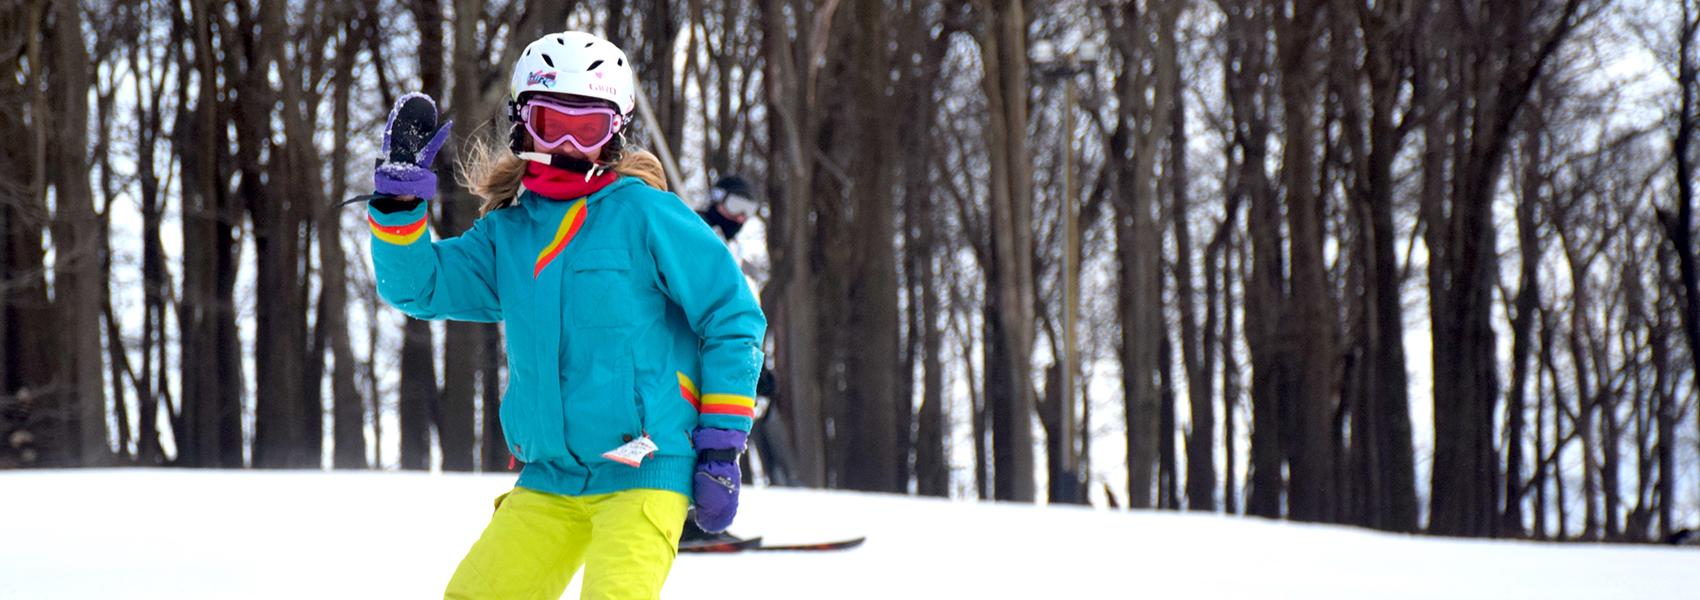 female-snowboarder